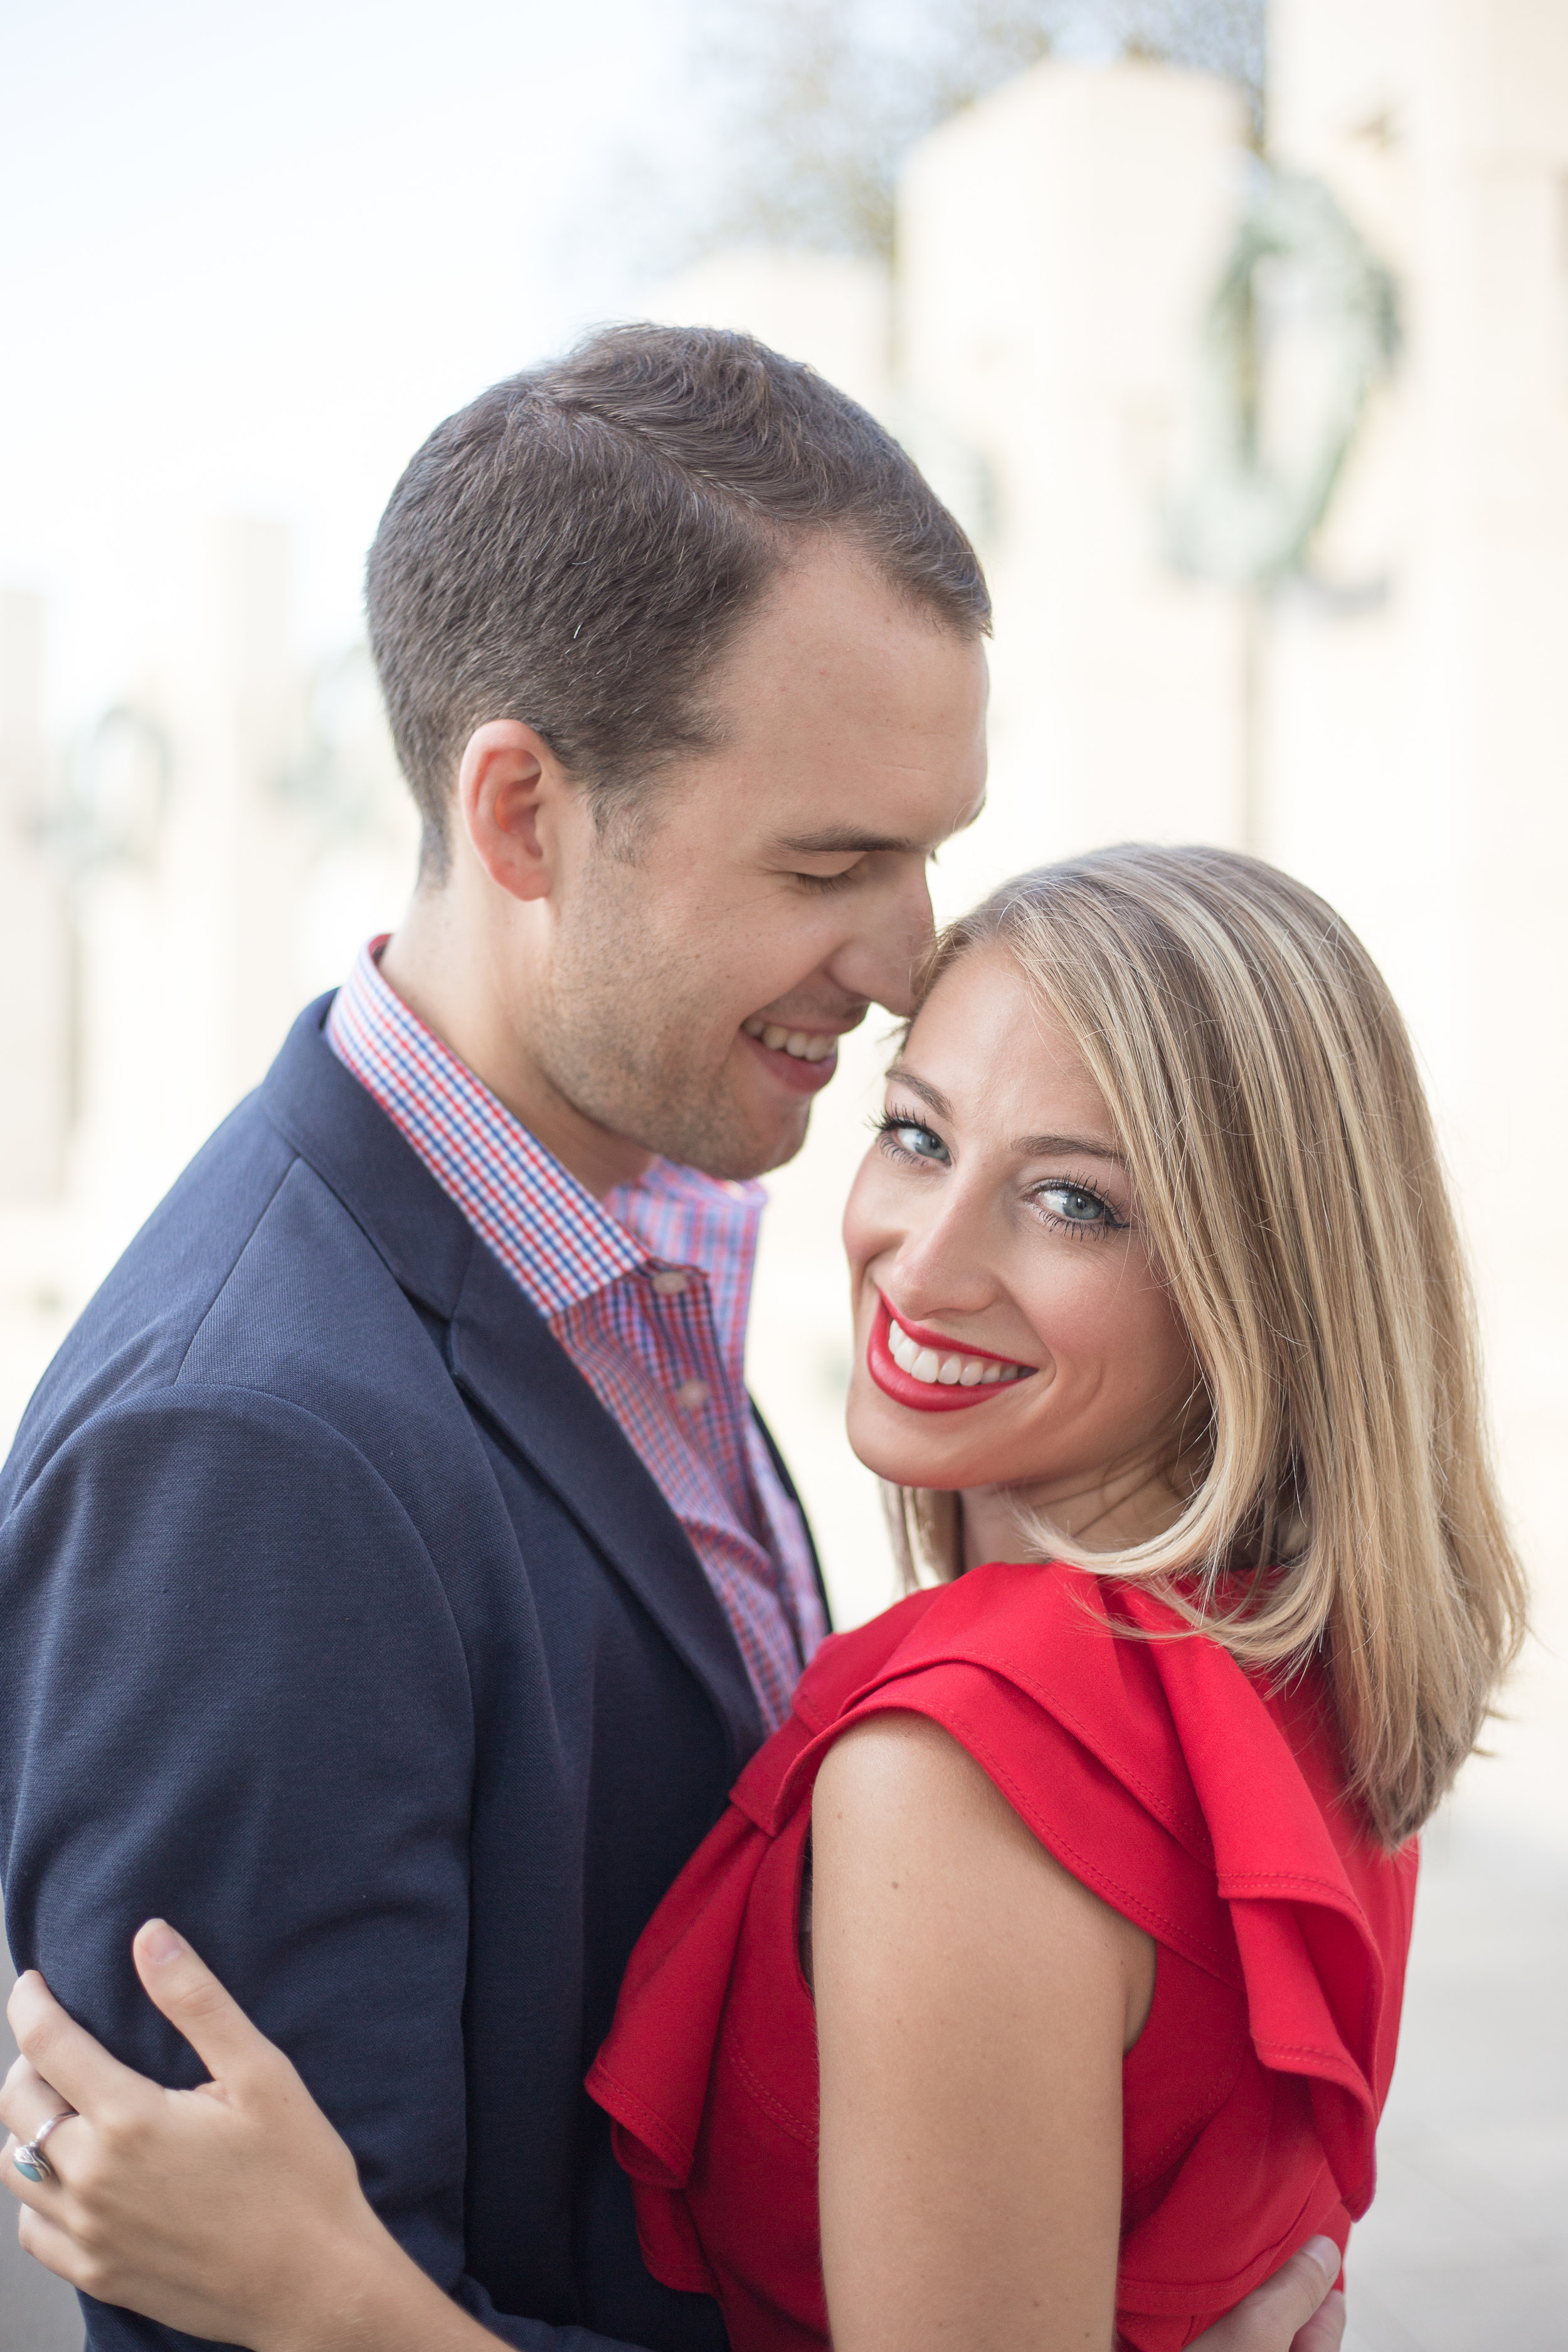 Capital Couple Sweetheart Session - Skyler Anne Photography LLC